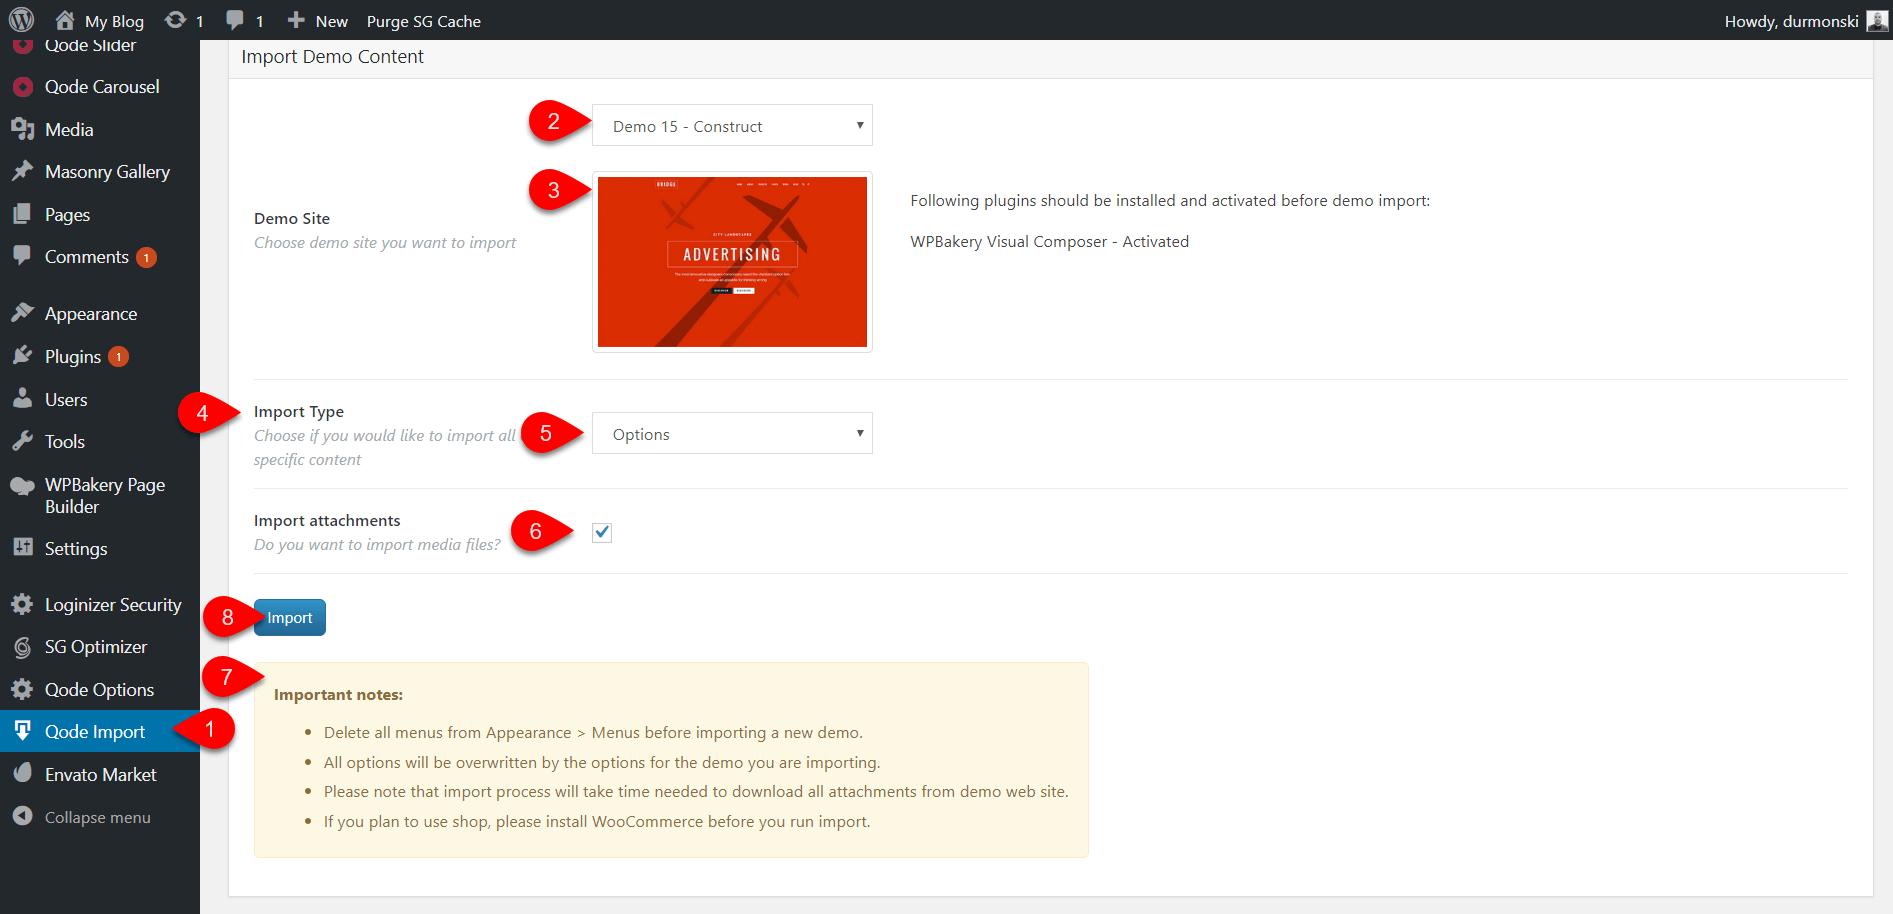 Review of the WordPress theme Bridge 23